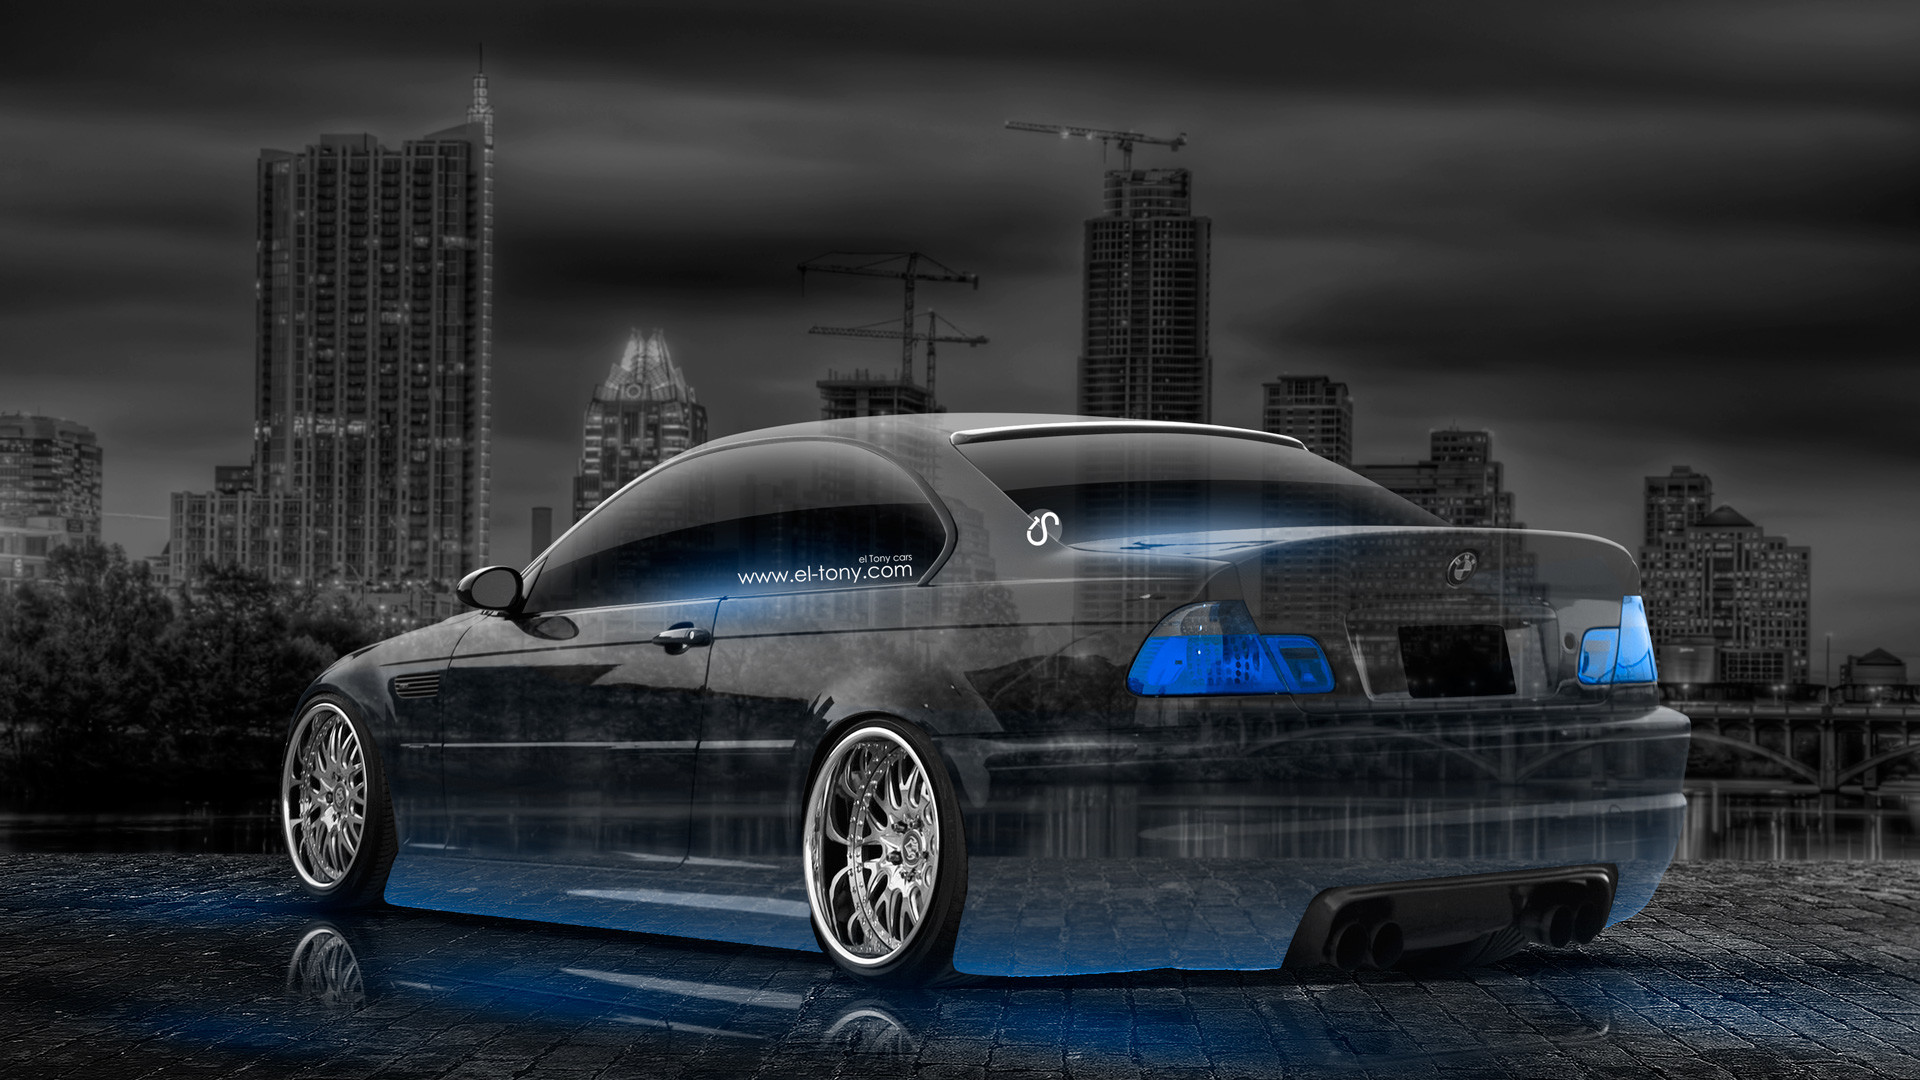 1242x2208 Black BMW E46 Car Wallpaper #Iphone #Android #BMW #car #wallpaper  More